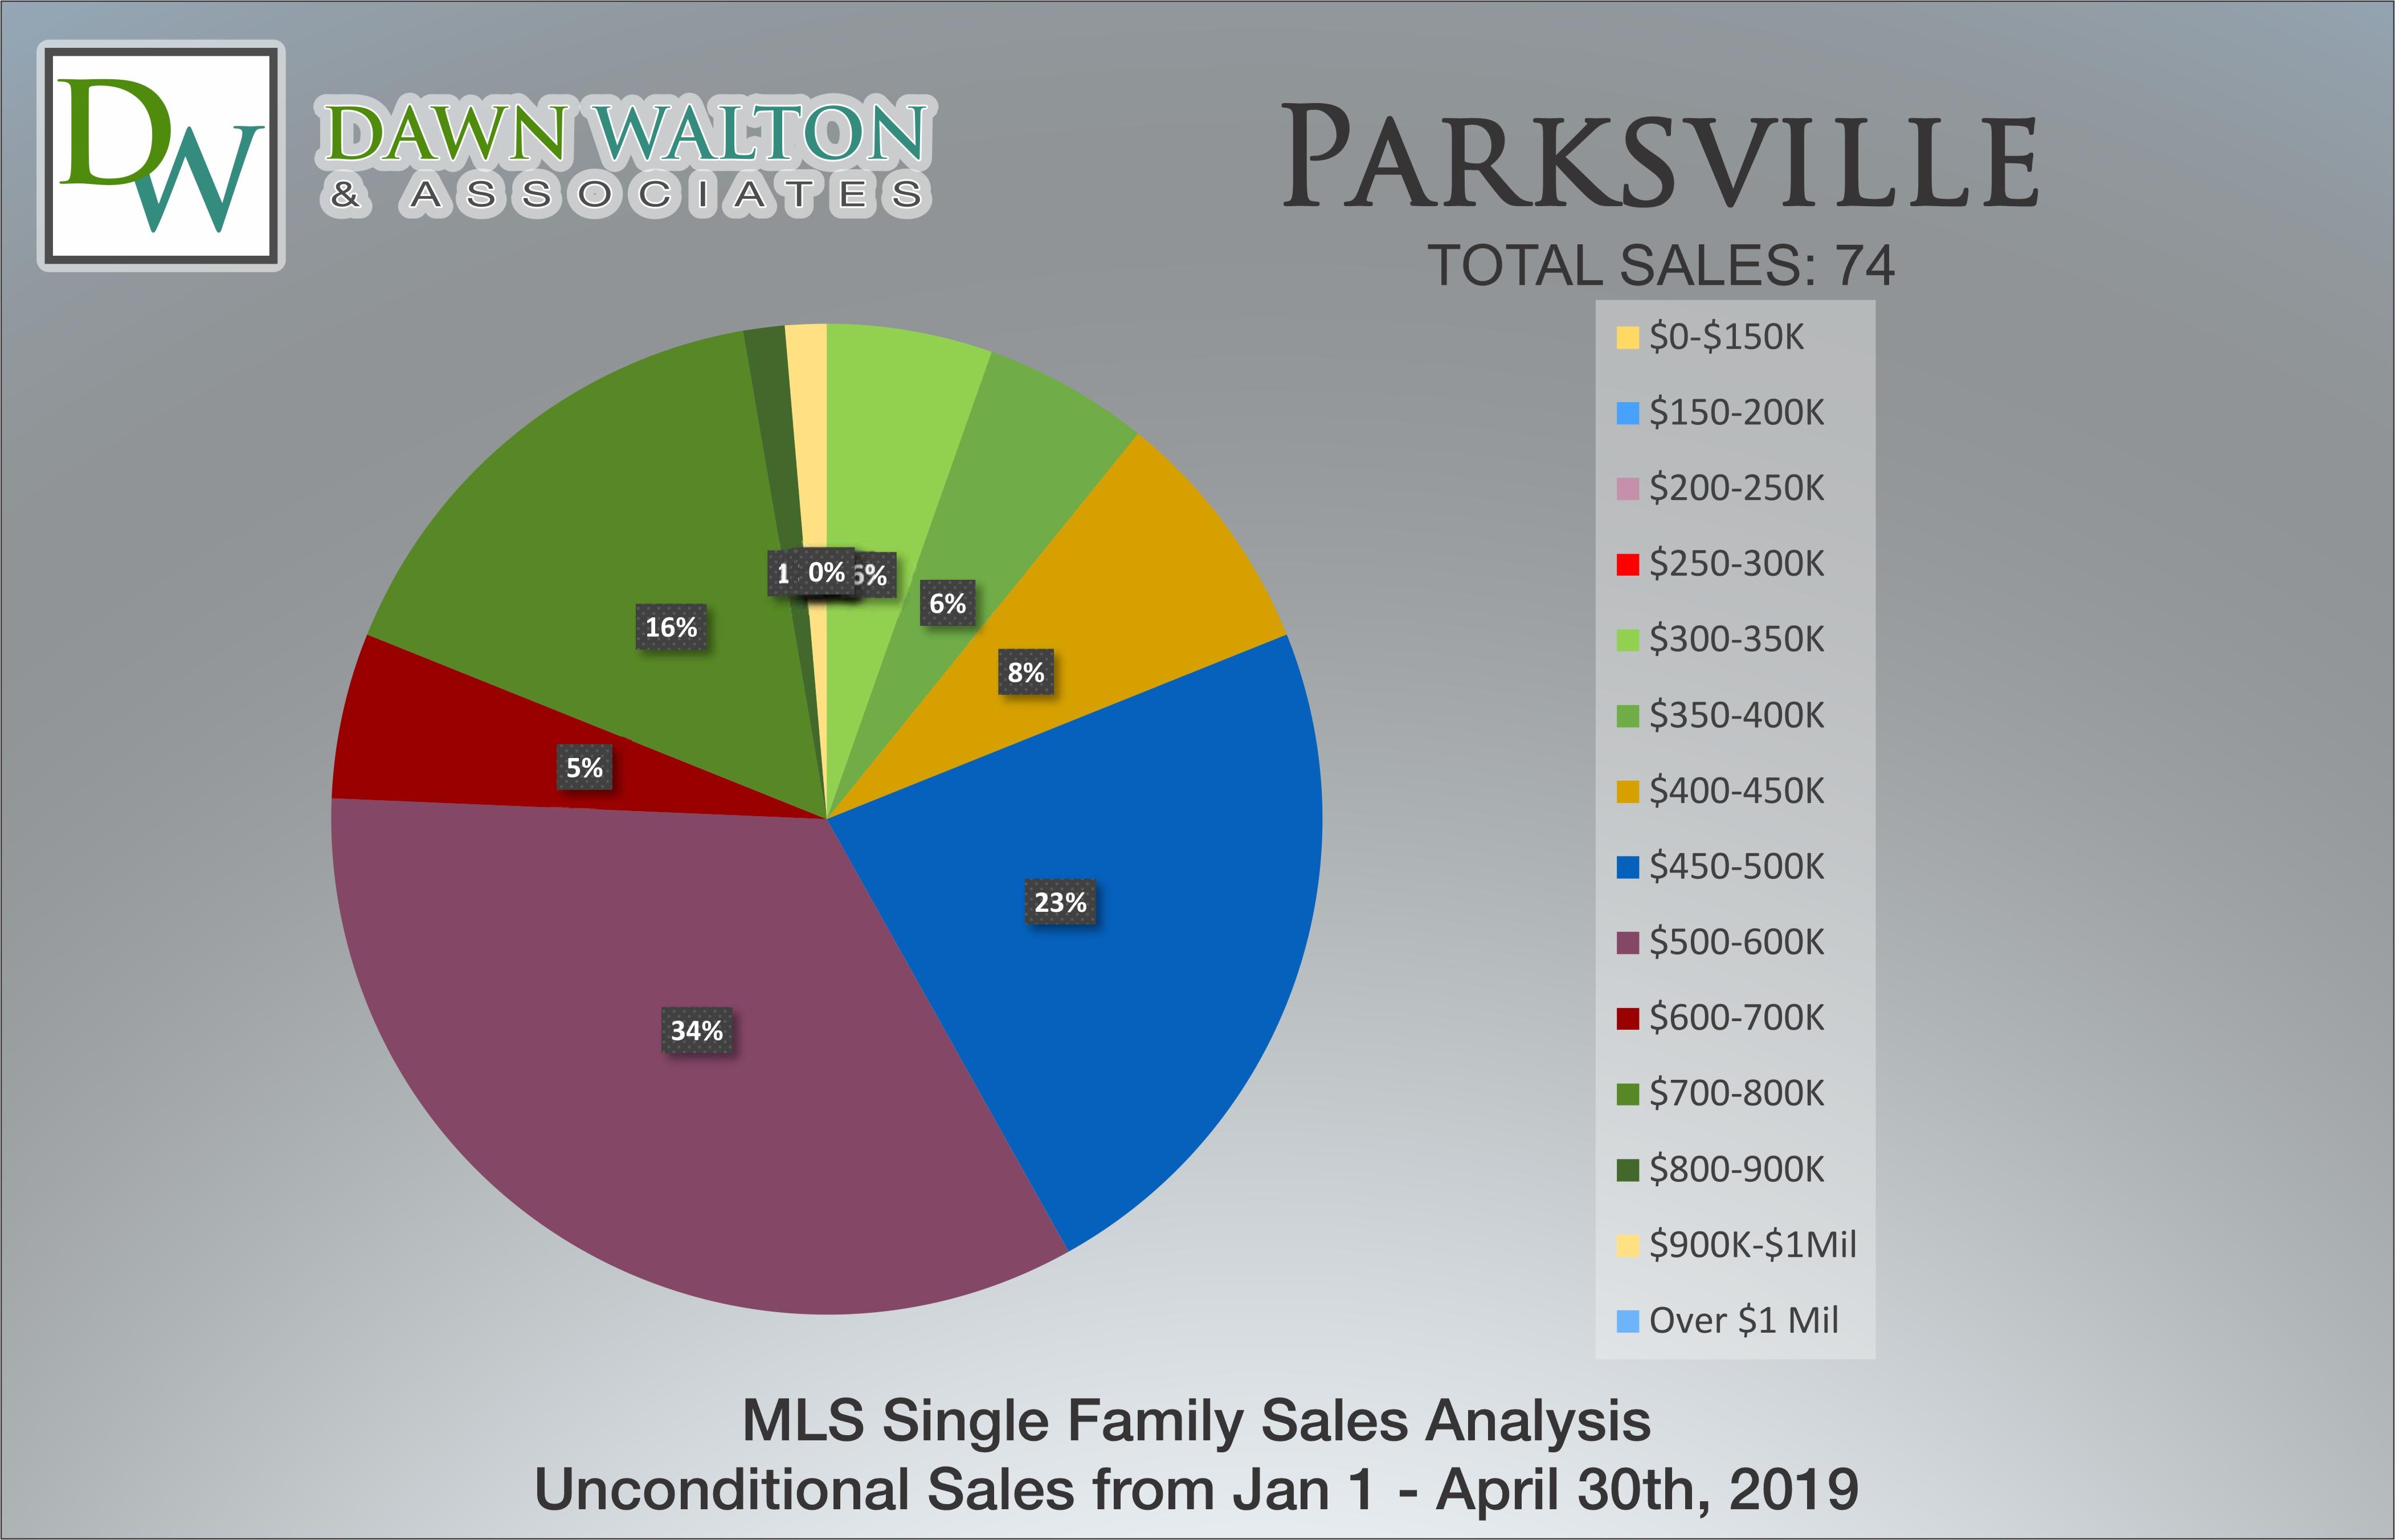 Parksville Real Estate Market Stats Price Percentage Jan 1 - April 30, 2019 - Nanaimo Realtor Dawn Walton